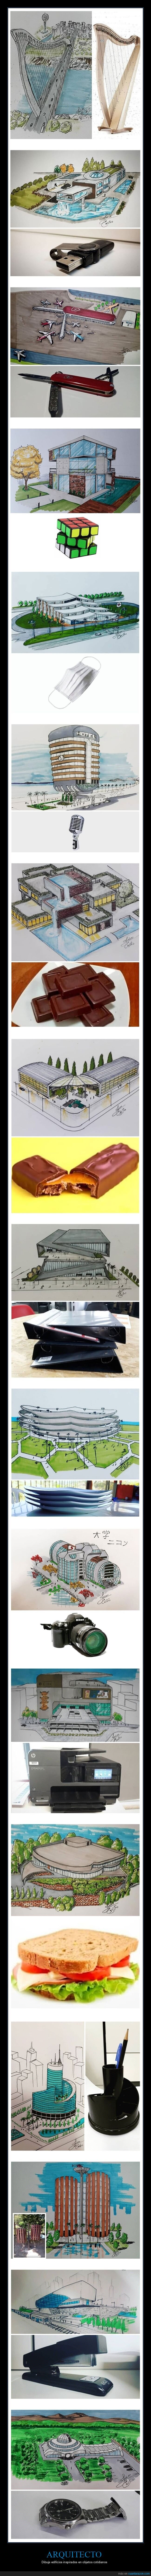 arquitecto,edificios,objetos